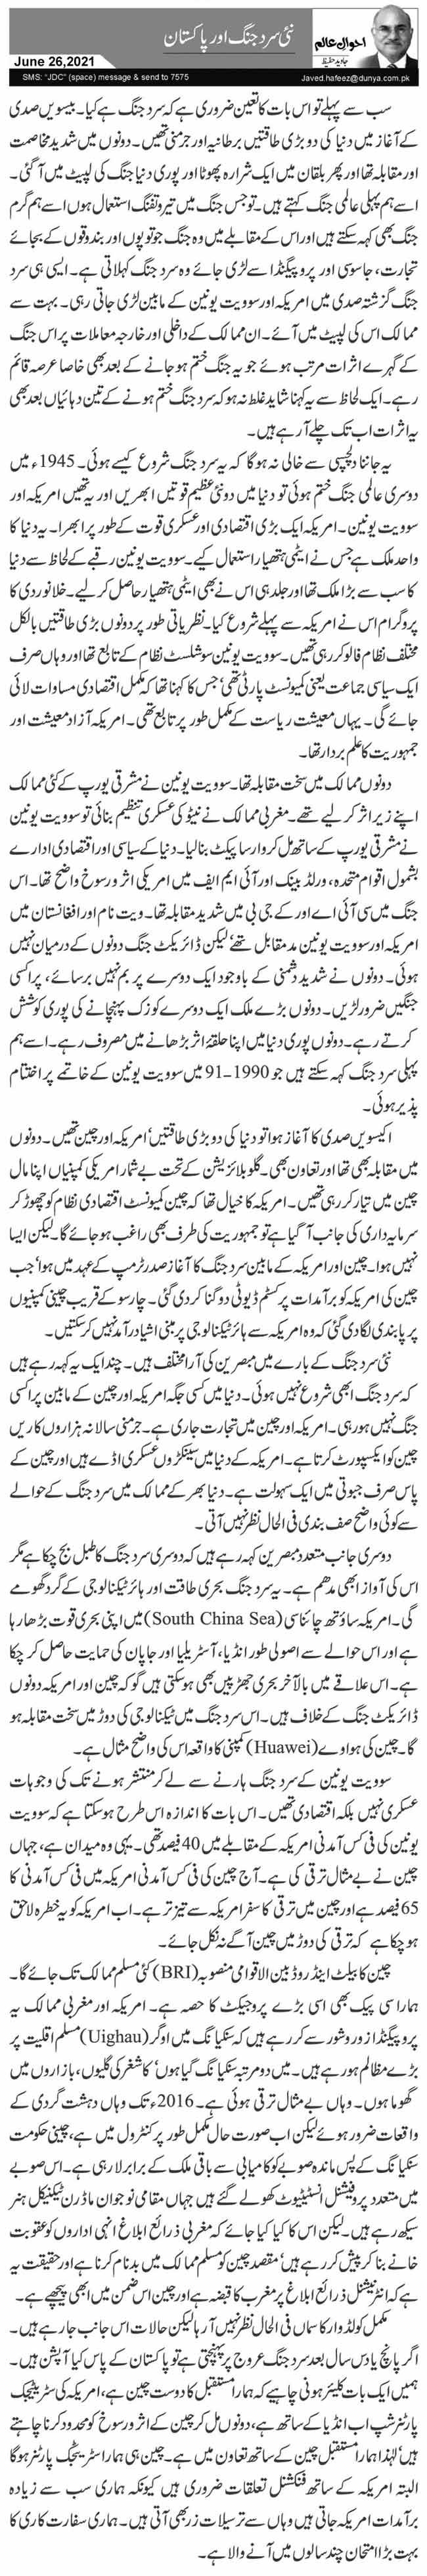 نئی سرد جنگ اور پاکستان